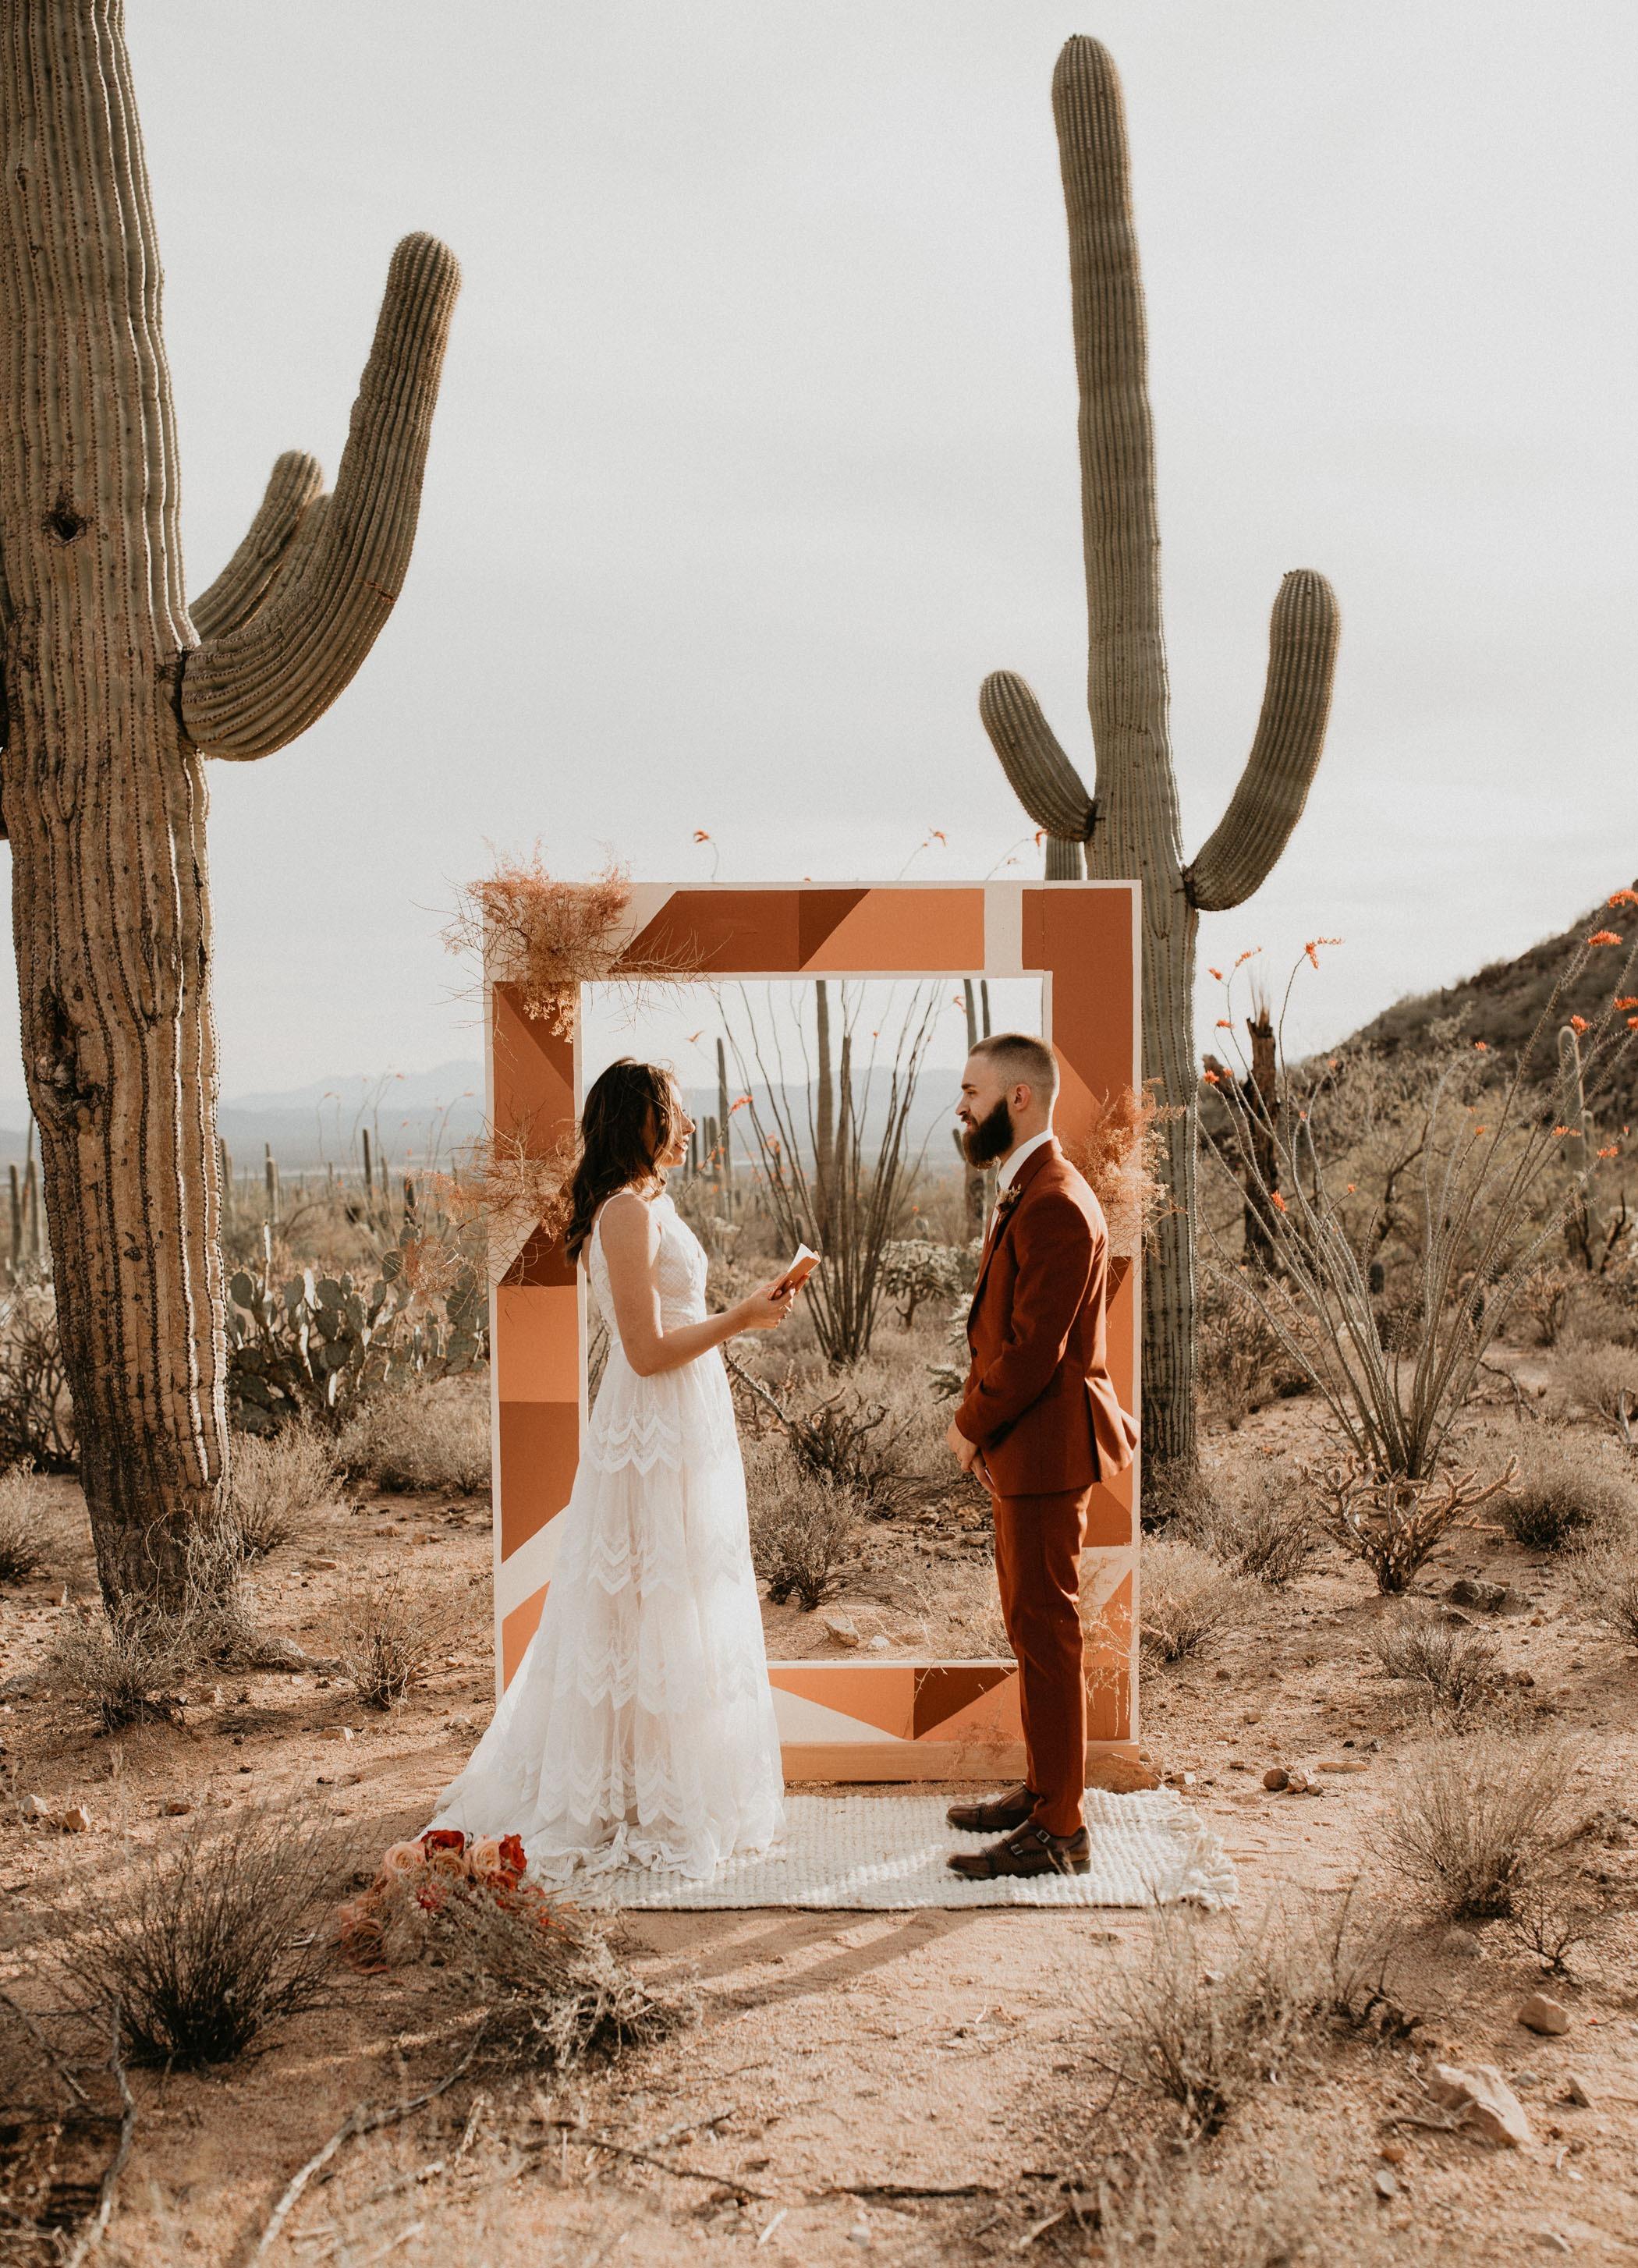 geometric painted wood rectangle DIY wedding backdrop for a desert elopement